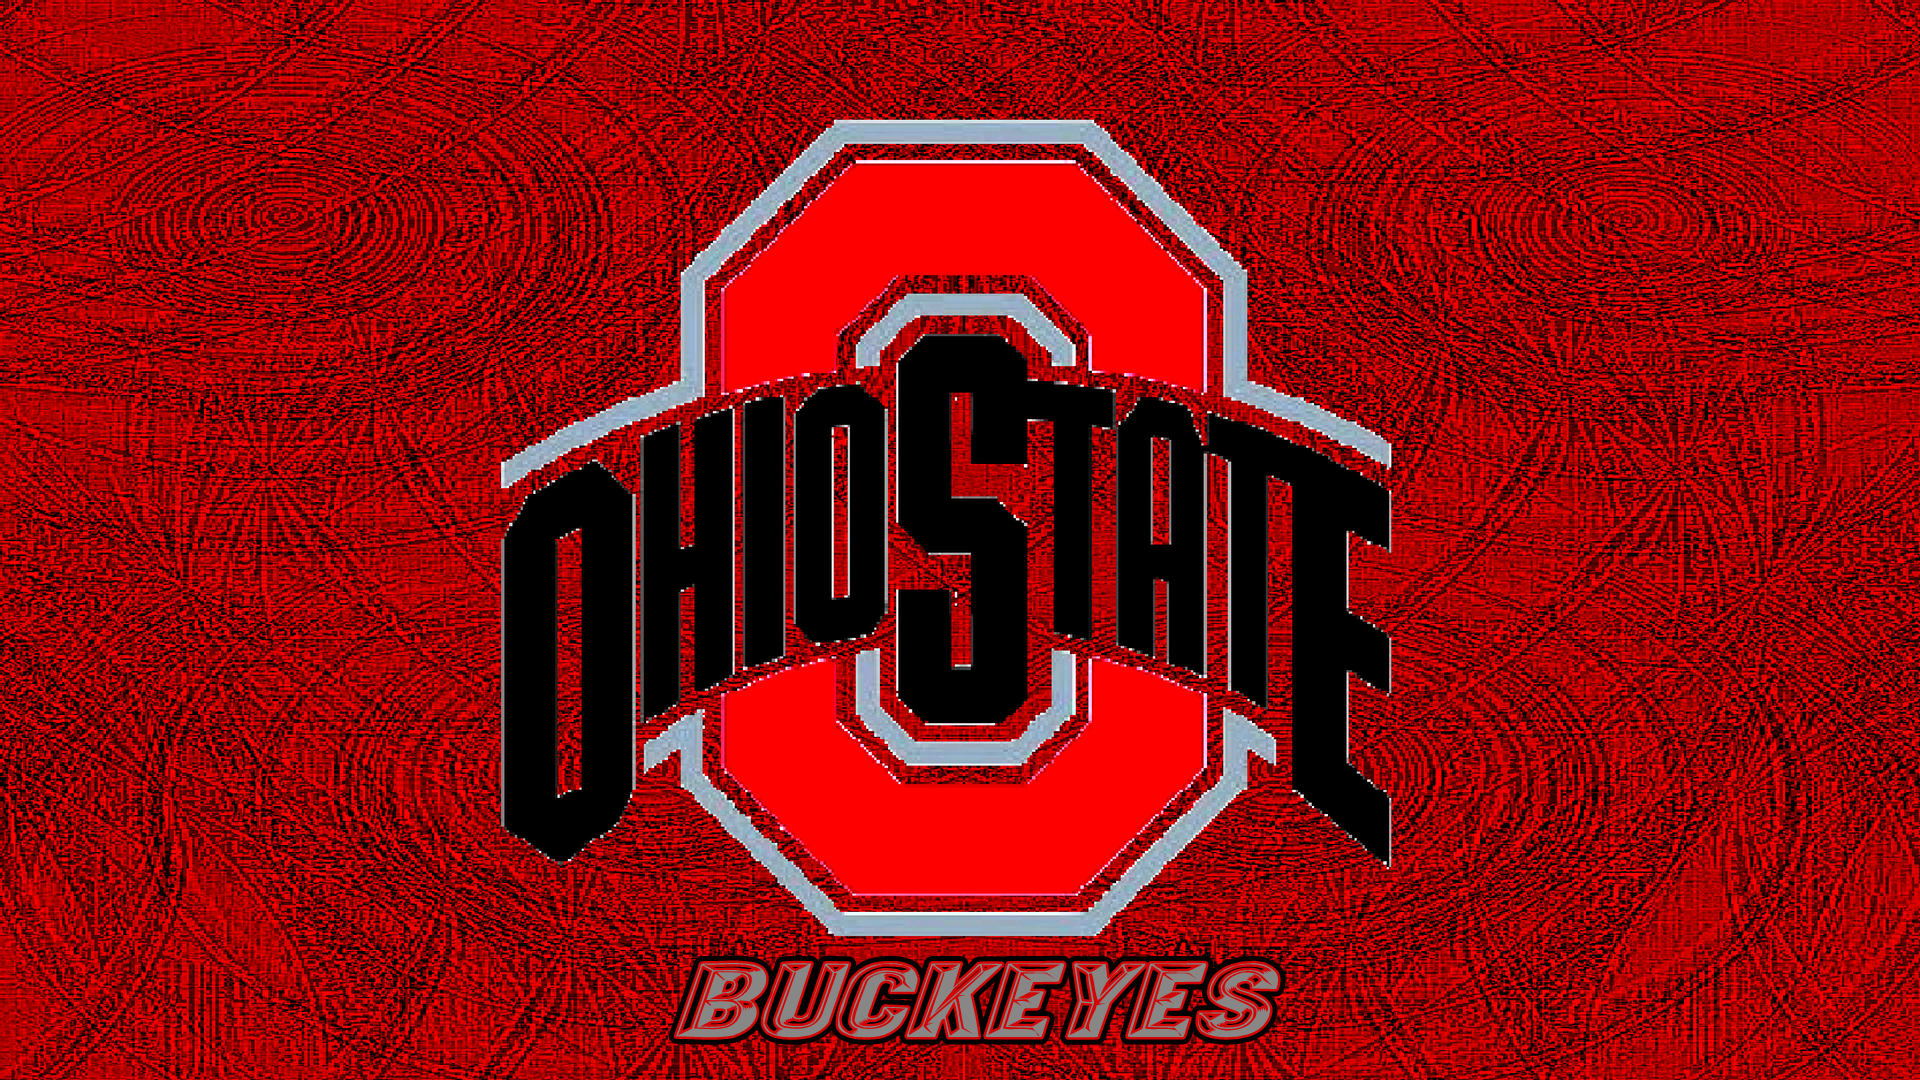 Ohio State Logo Wallpaper: Ohio State Phone Wallpaper